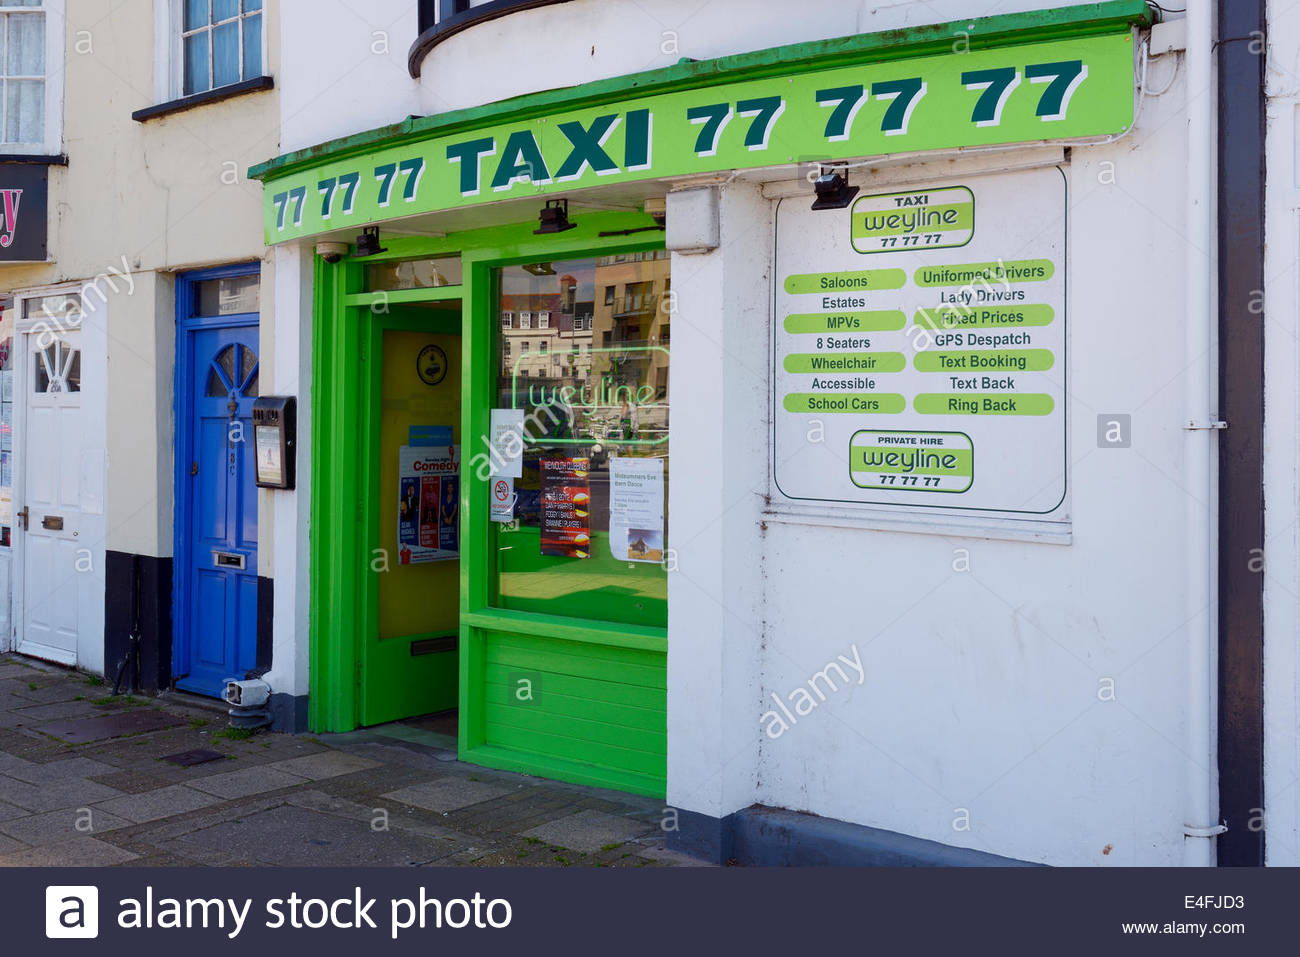 Weyline Taxi Taxi Buro Queen Street Weymouth Dorset England Uk